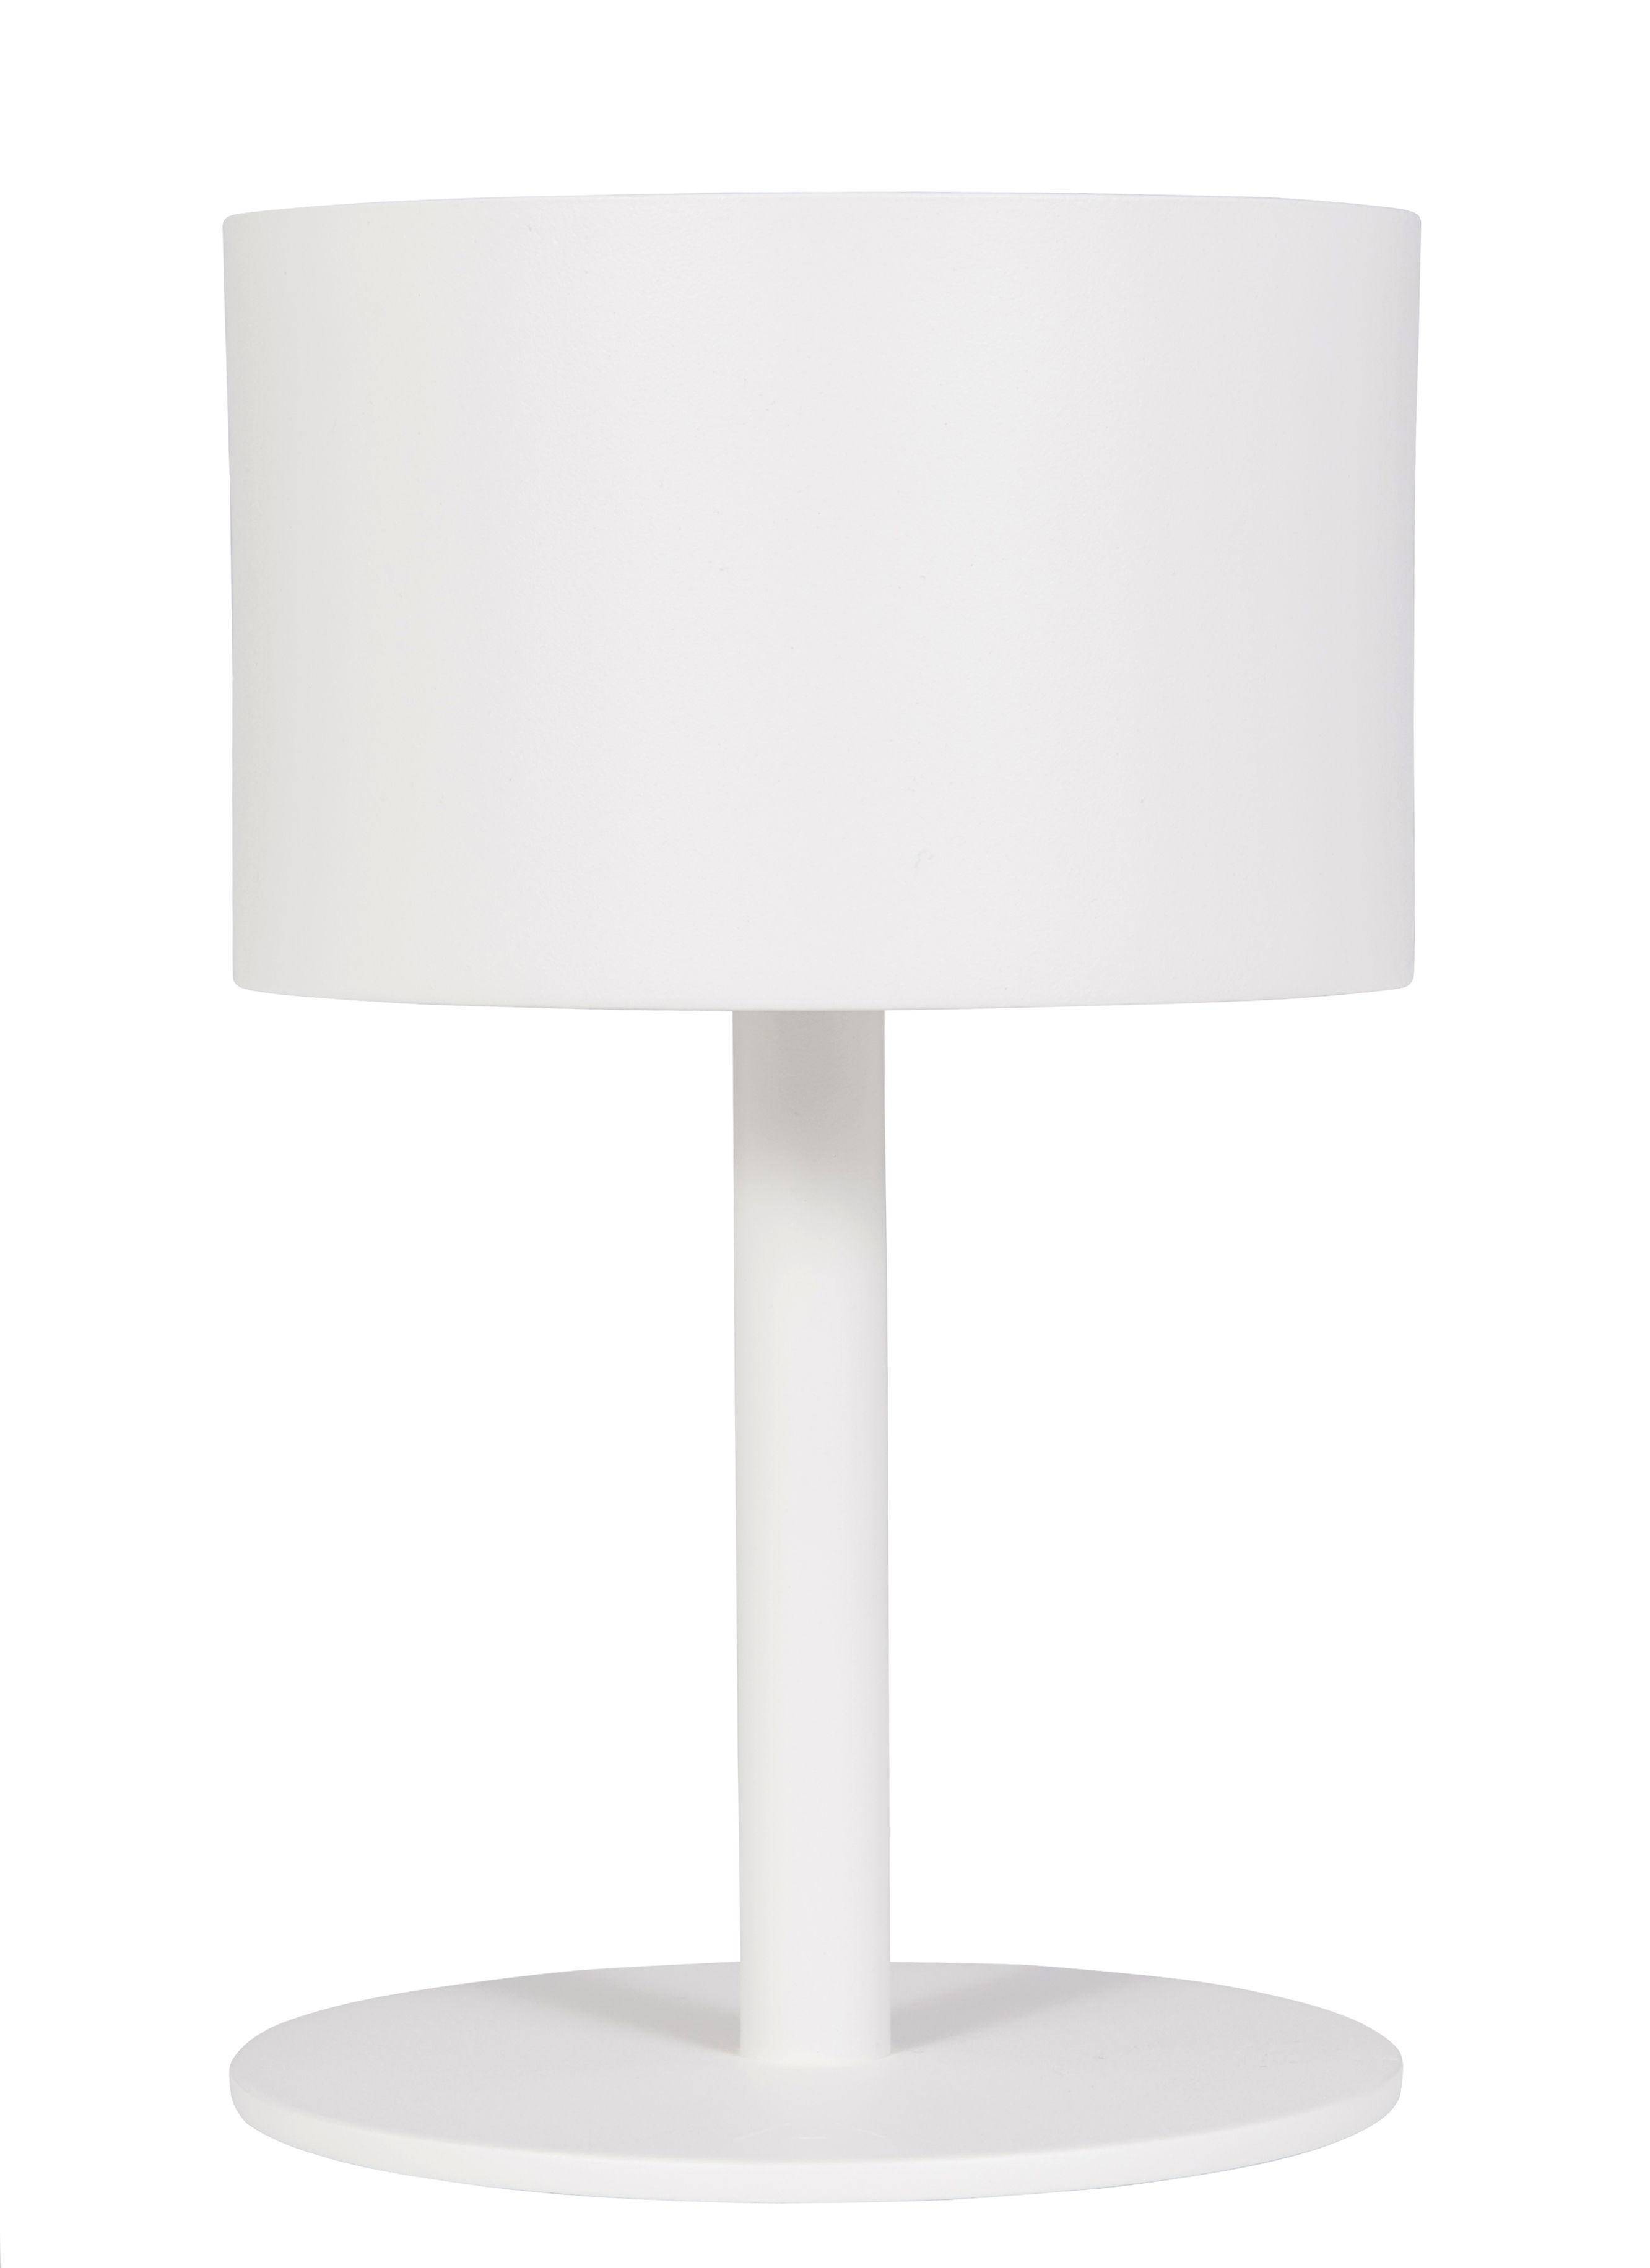 Luminaire - Lampes de table - Lampe solaire La Lampe Pose 01 / LED - Sans fil - Maiori - Blanc - Aluminium